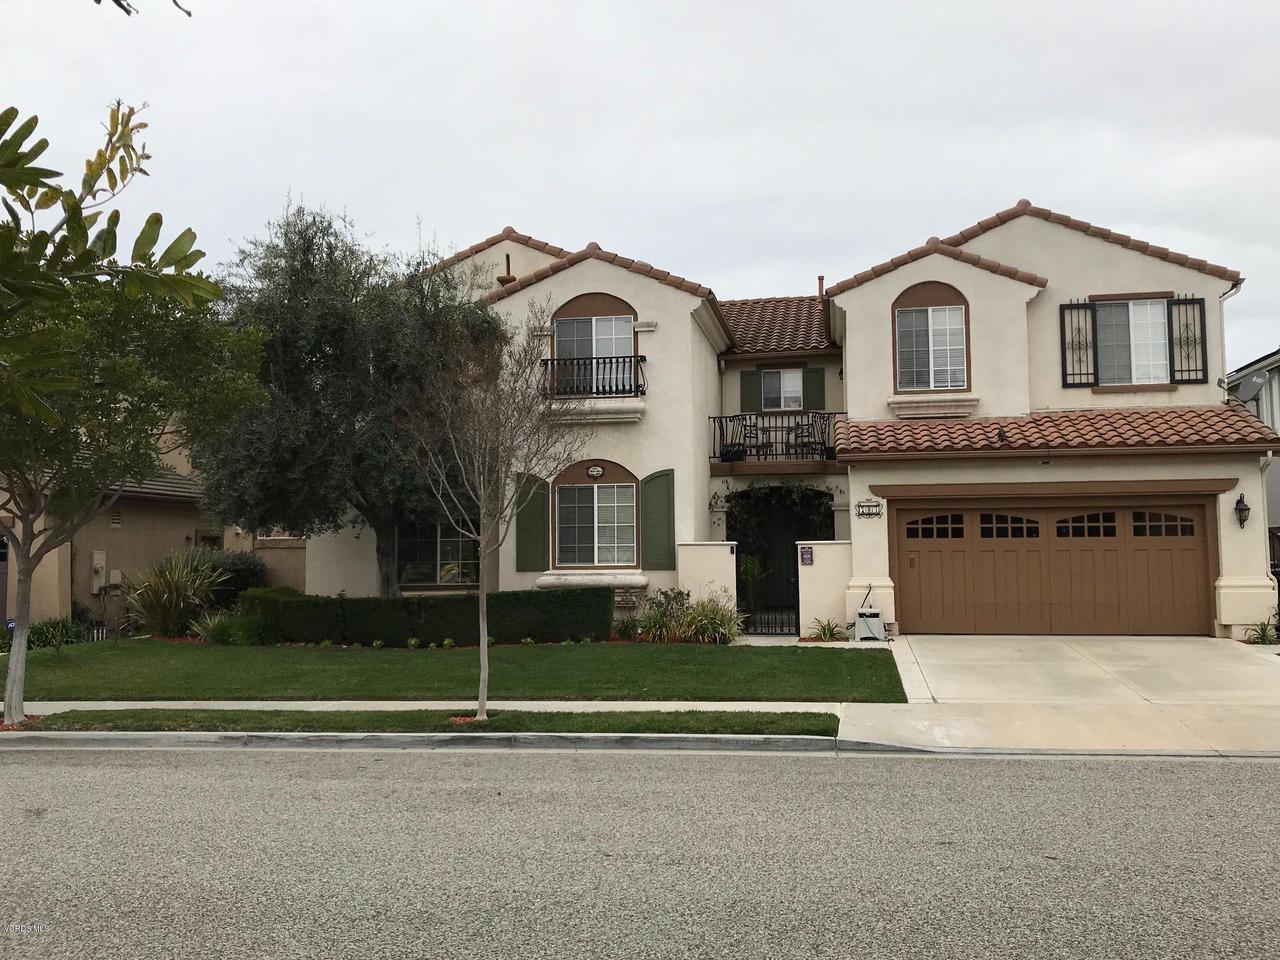 Photo of 703 SEEGER AVENUE, Ventura, CA 93003